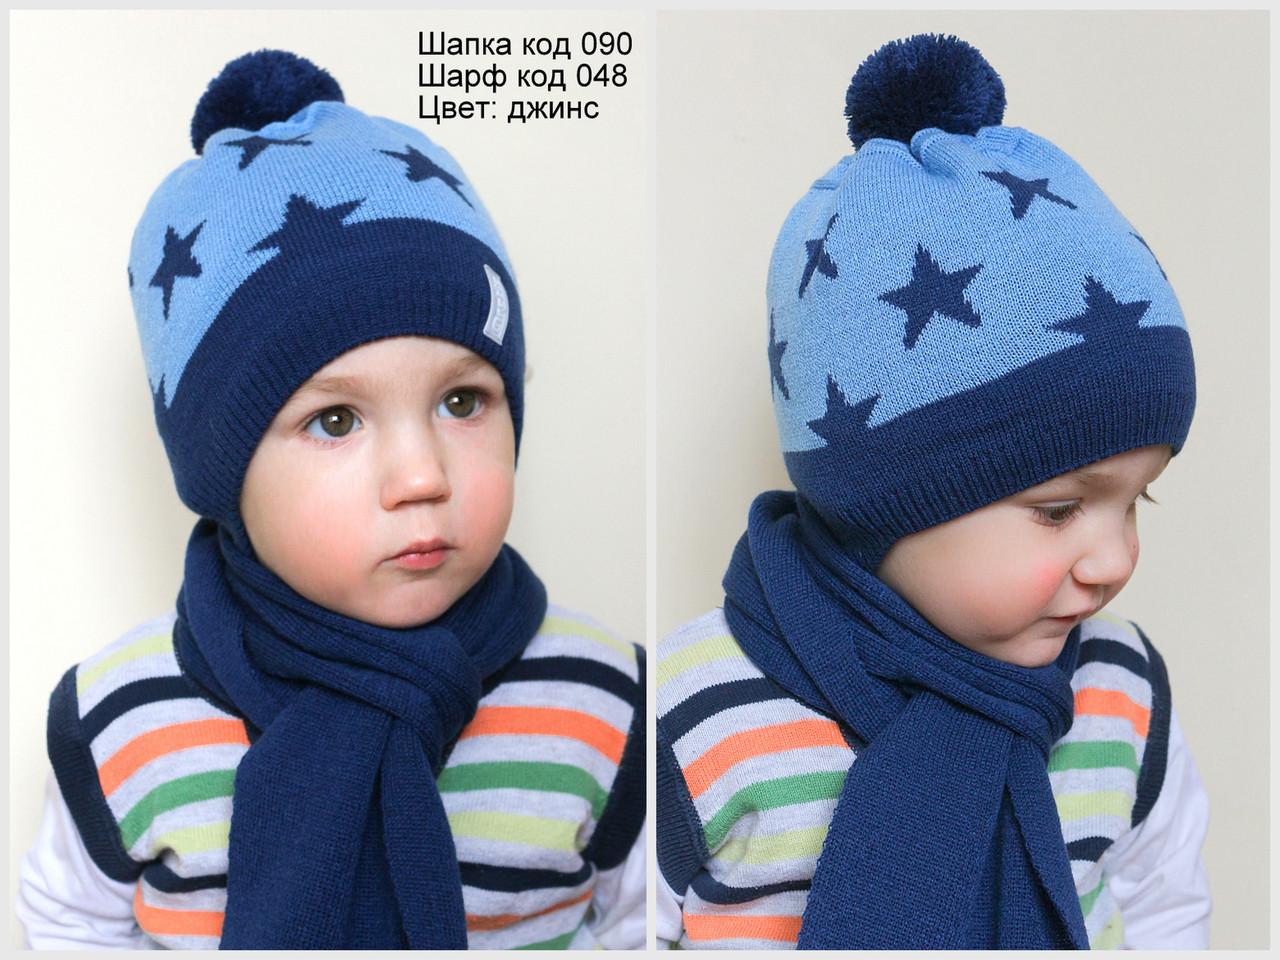 Яркая шапка для детей с завязками 9 месяцев, 10 месяцев, 11 месяцев, 1 год, 46, Джинс